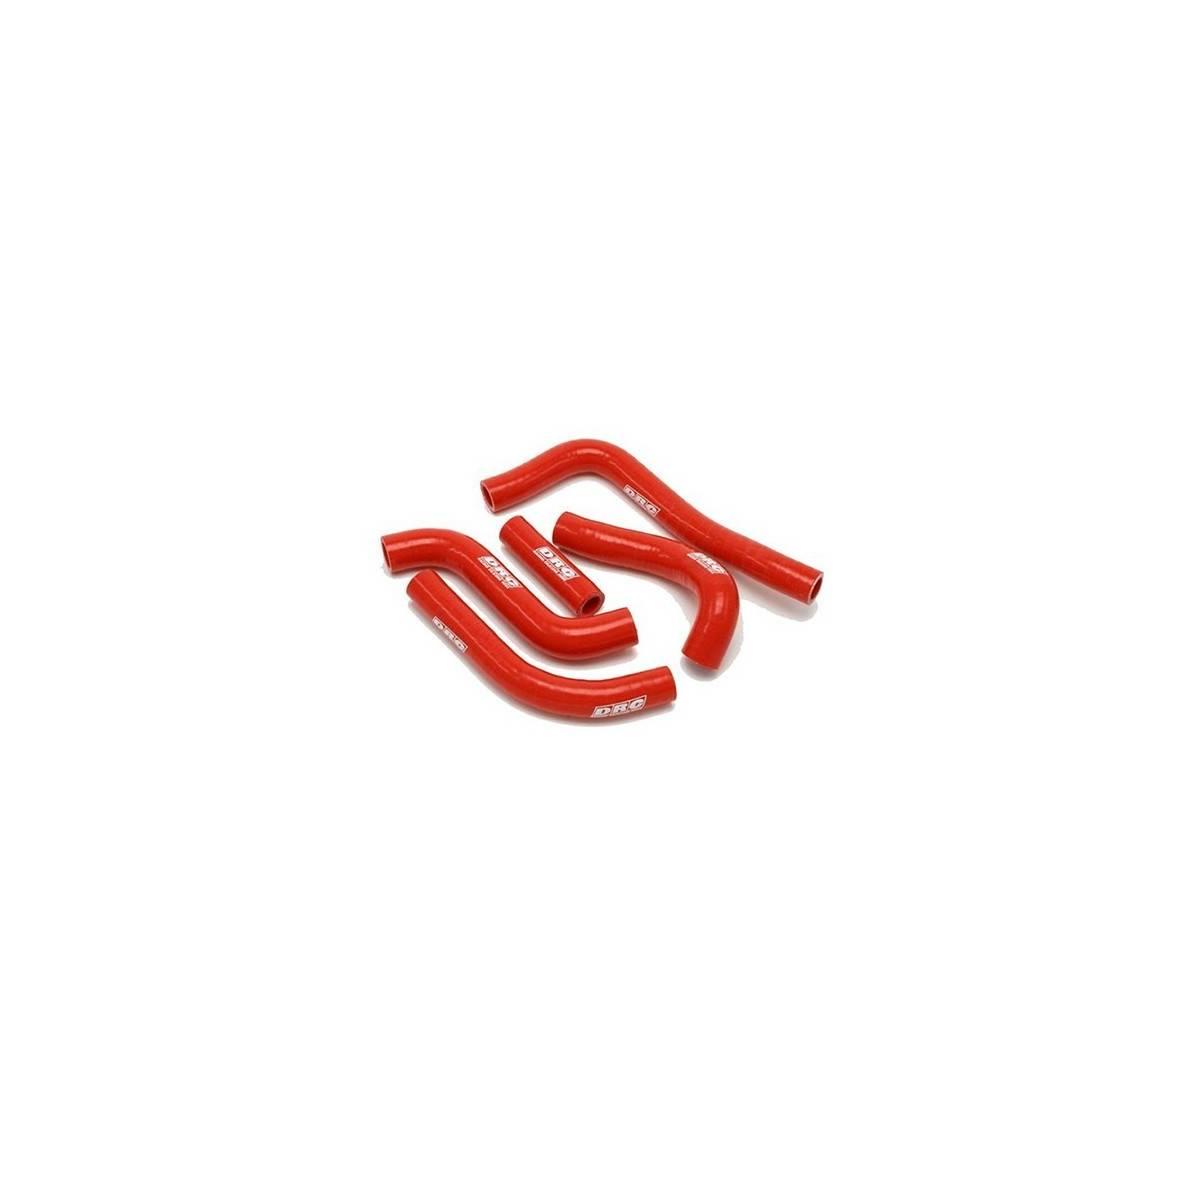 D47.01.403 - Kit Manguitos Radiador Suzuki Rm85 ´02- Rojo